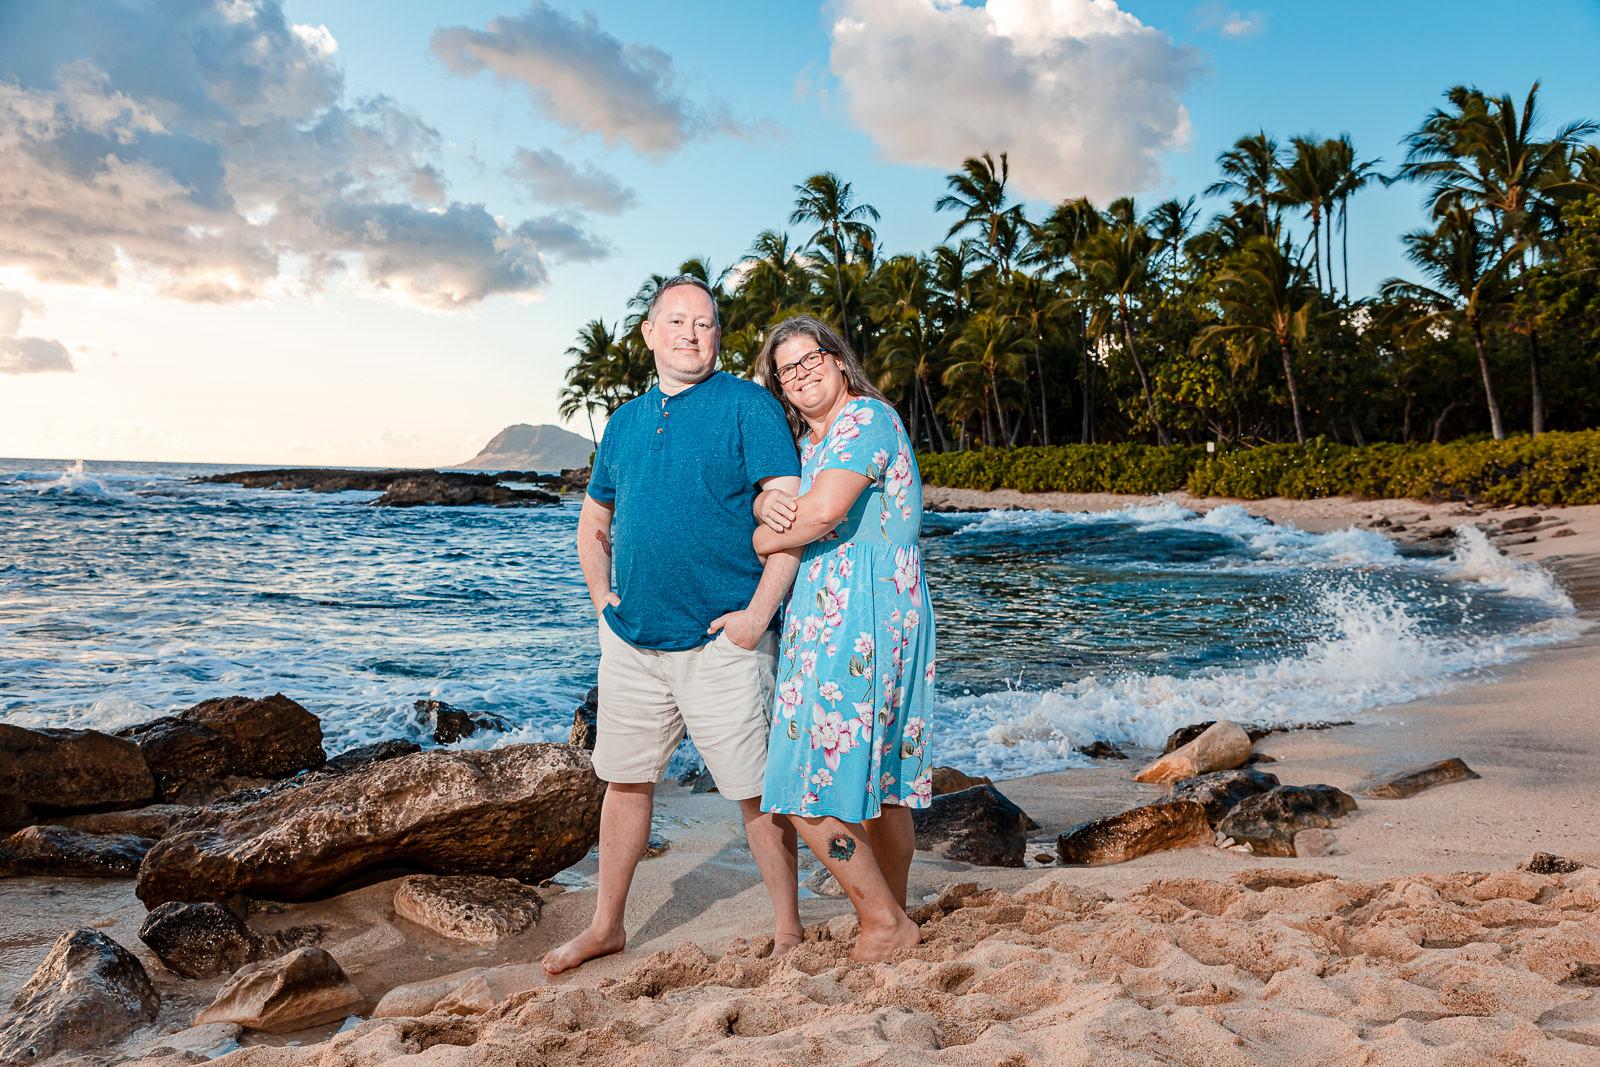 Oahu2019-9377.jpg